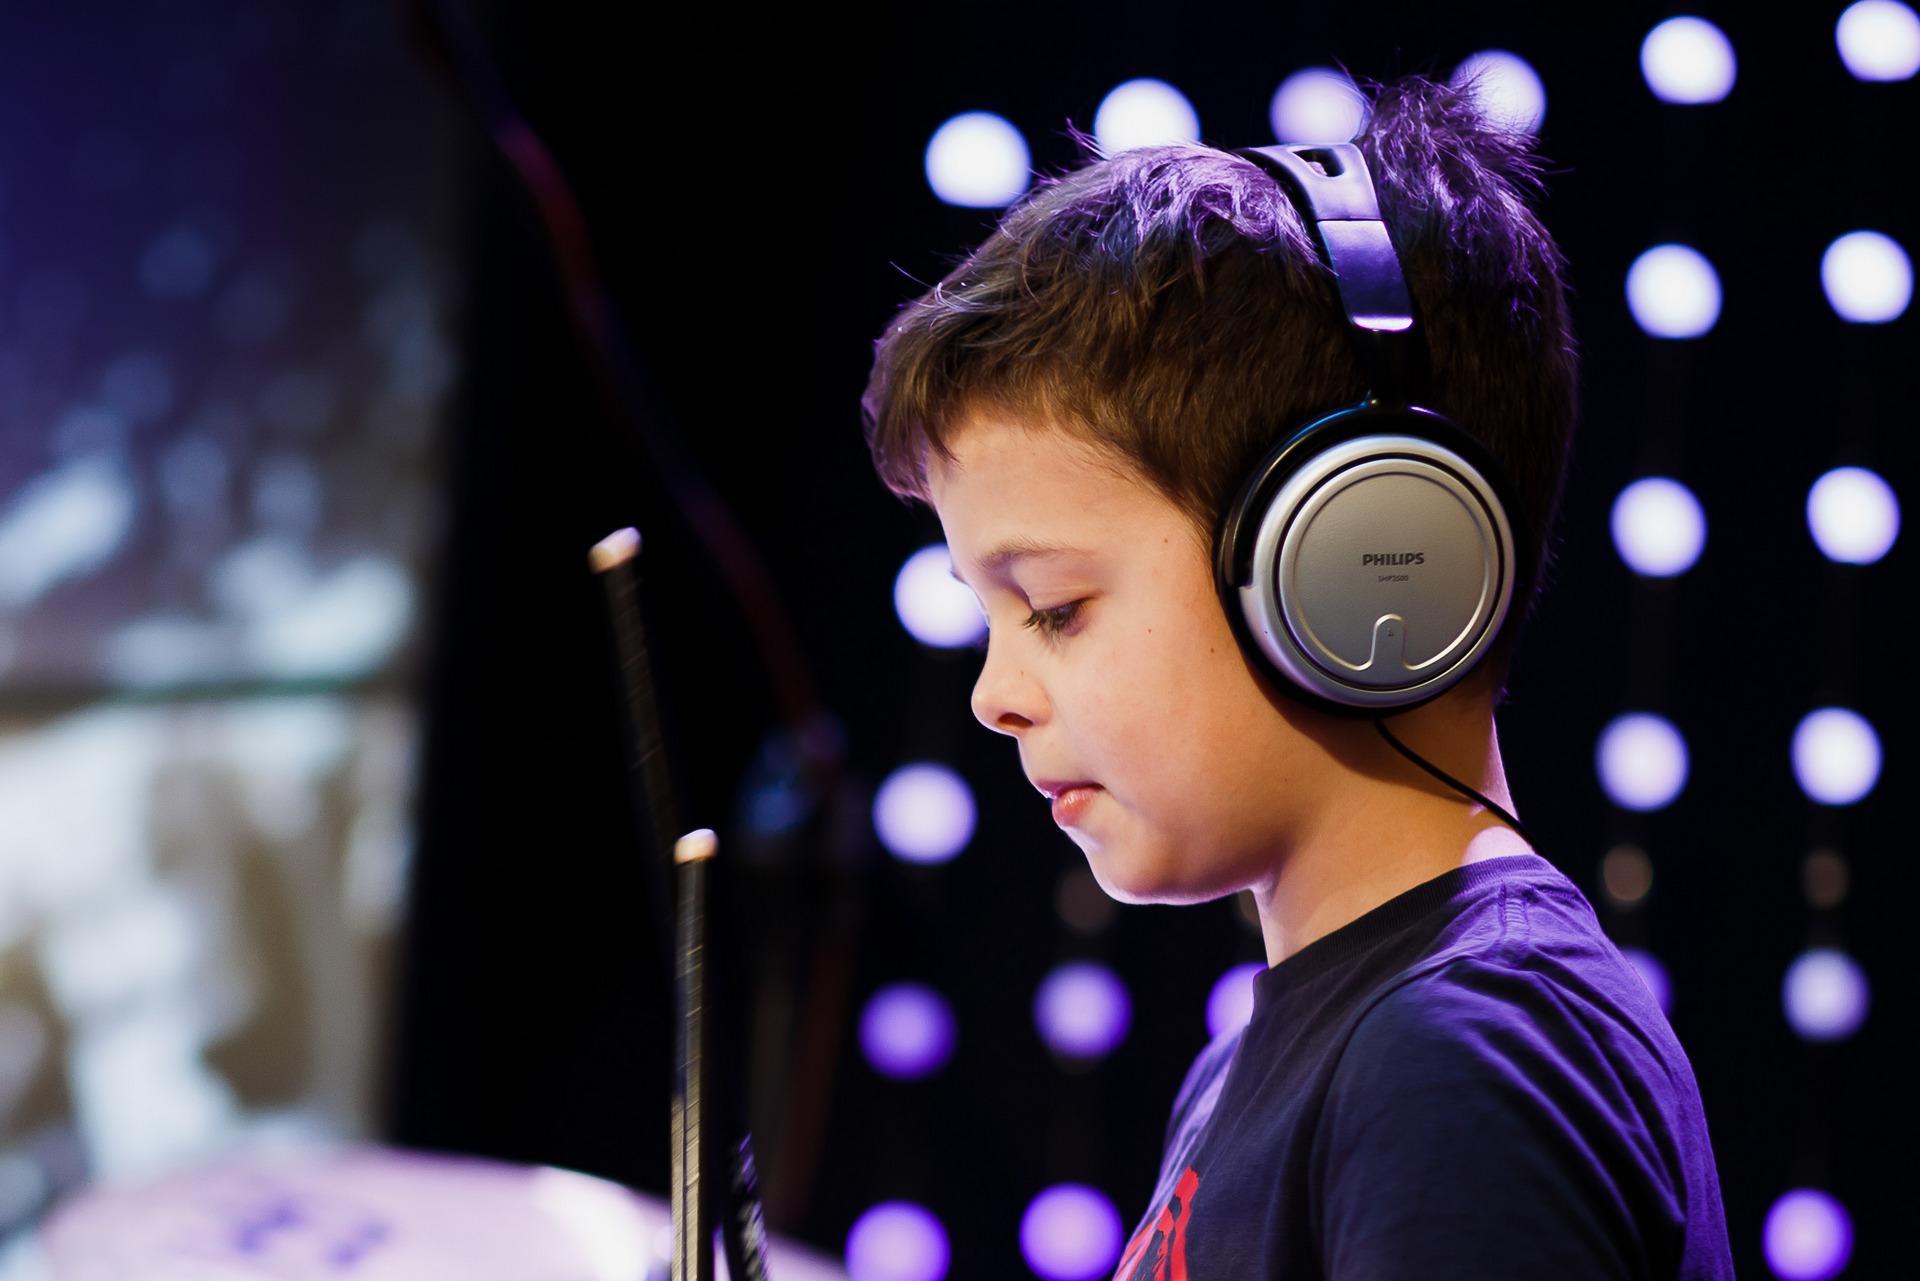 nauka gry na perkusji lekcje perkusji